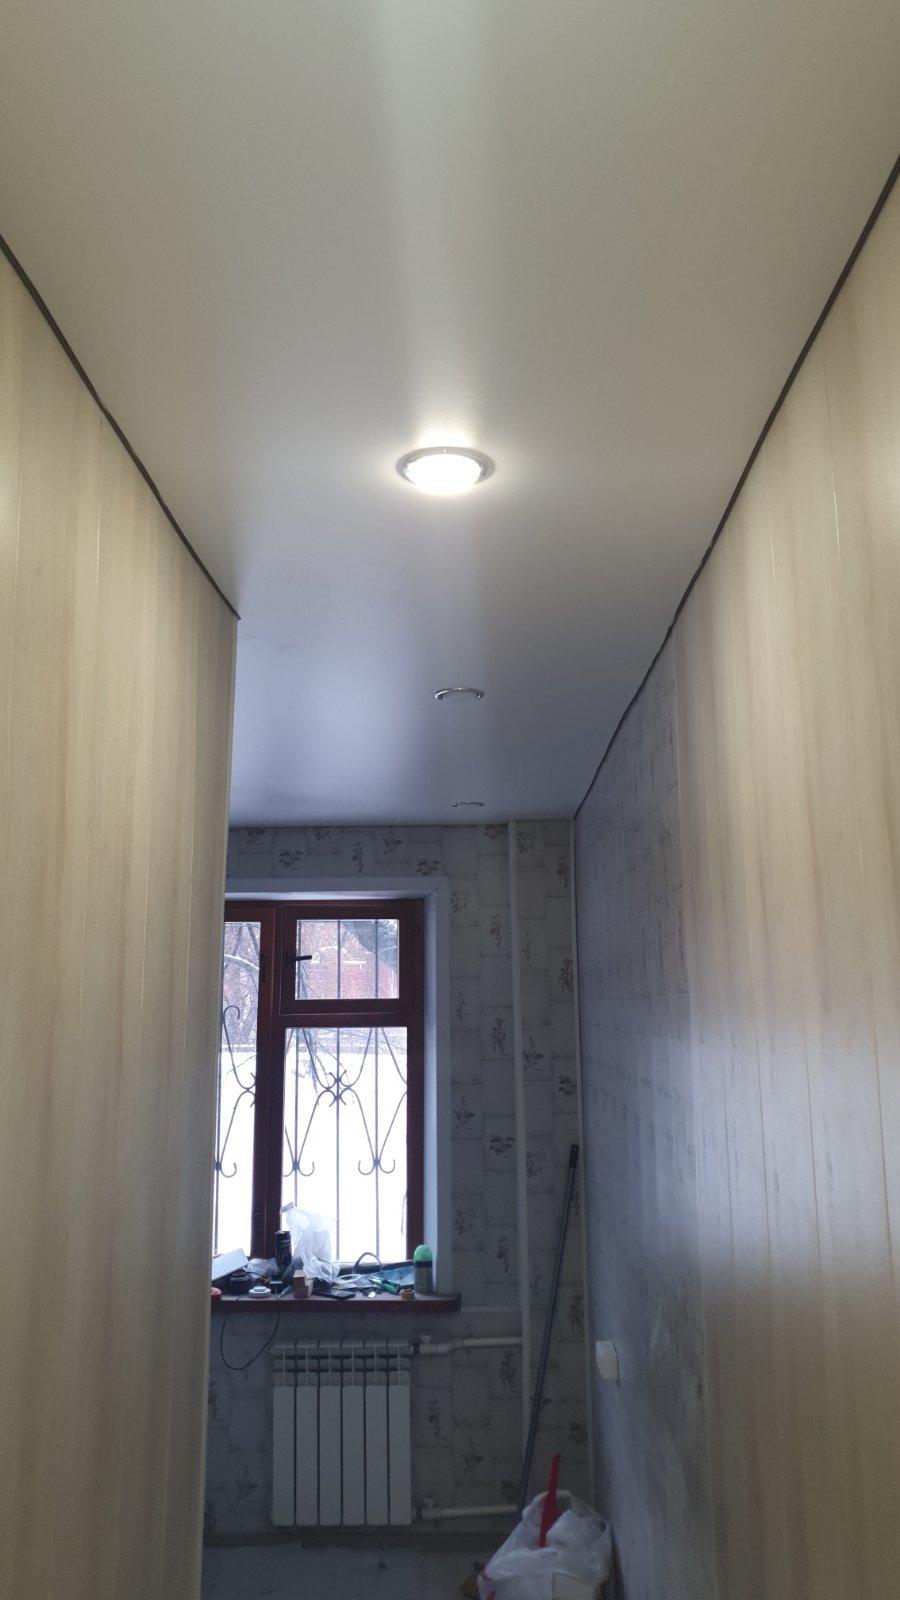 Продаётся 1-комнатная квартира 31.6 кв.м. этаж 1/5 за 2 600 000 руб